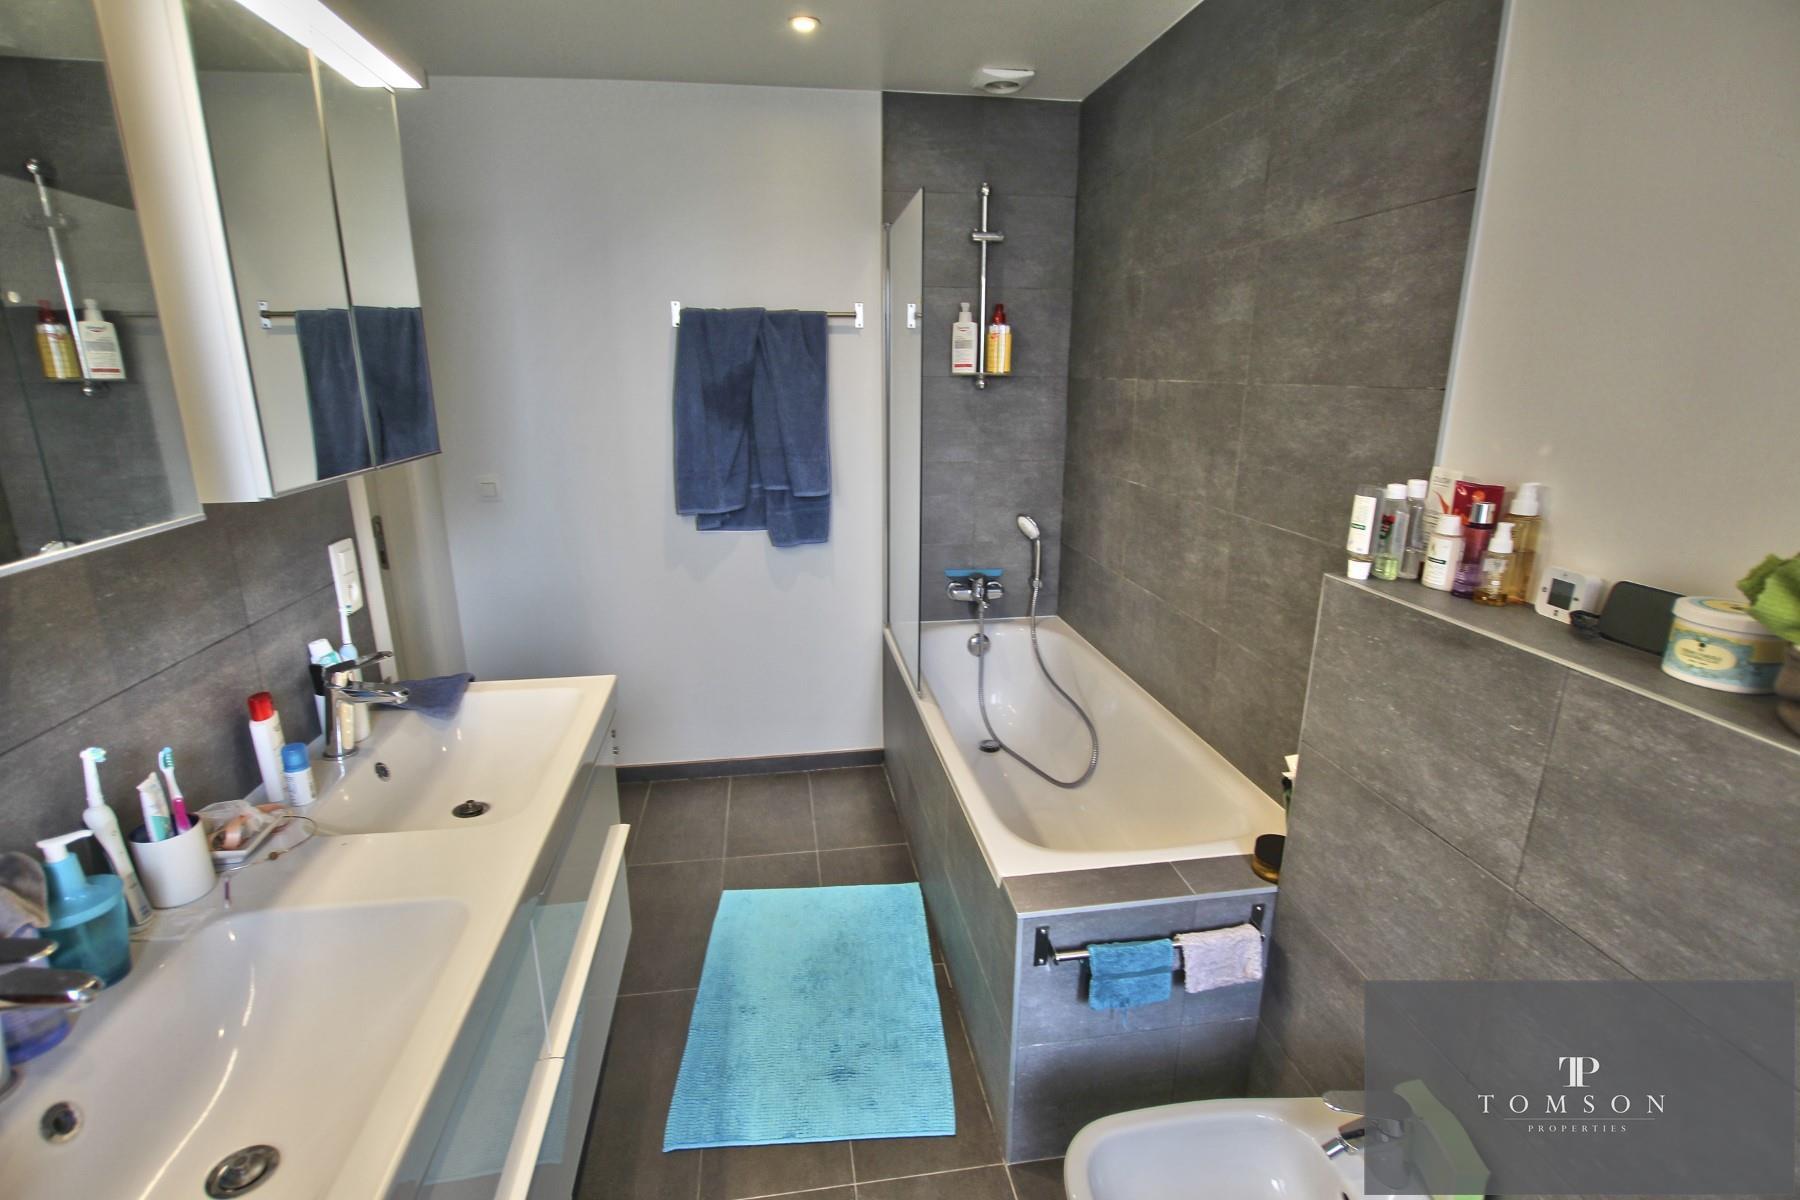 Appartement exceptionnel - Woluwe-Saint-Pierre - #4349832-9